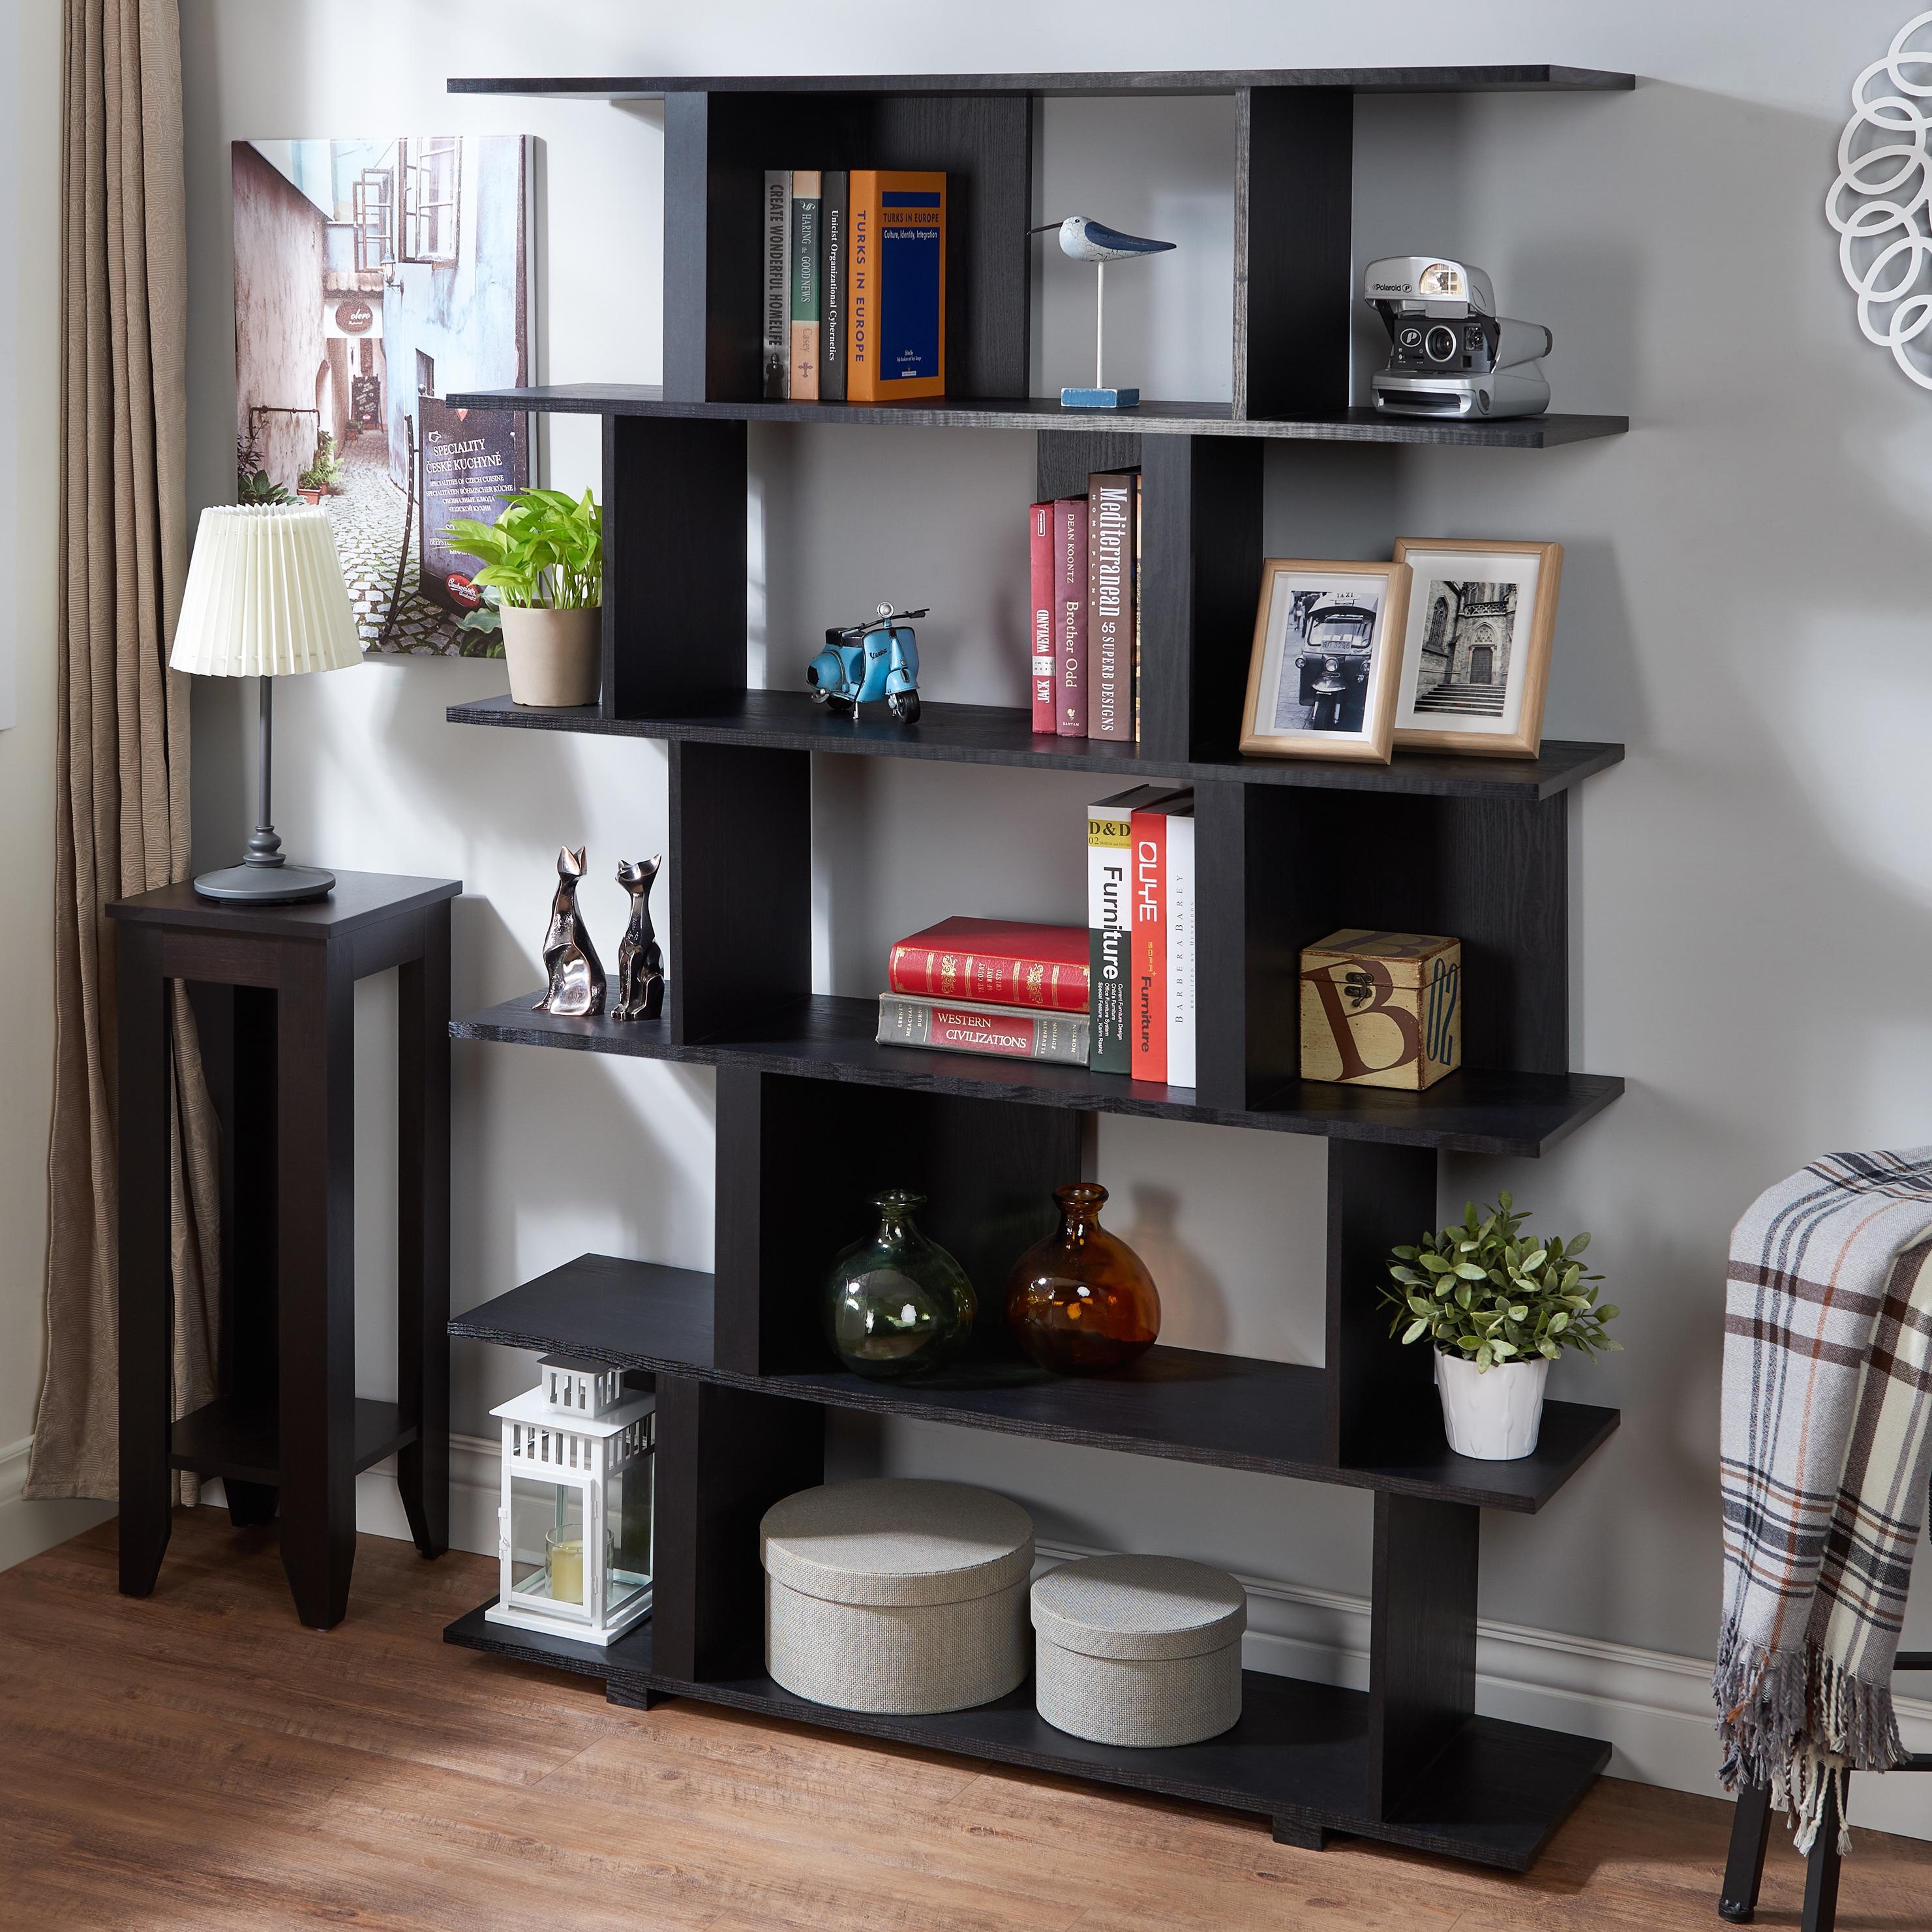 Furniture Of America Lian Modern Black Open Shelf Bookcase Room Divider Overstock 13777971